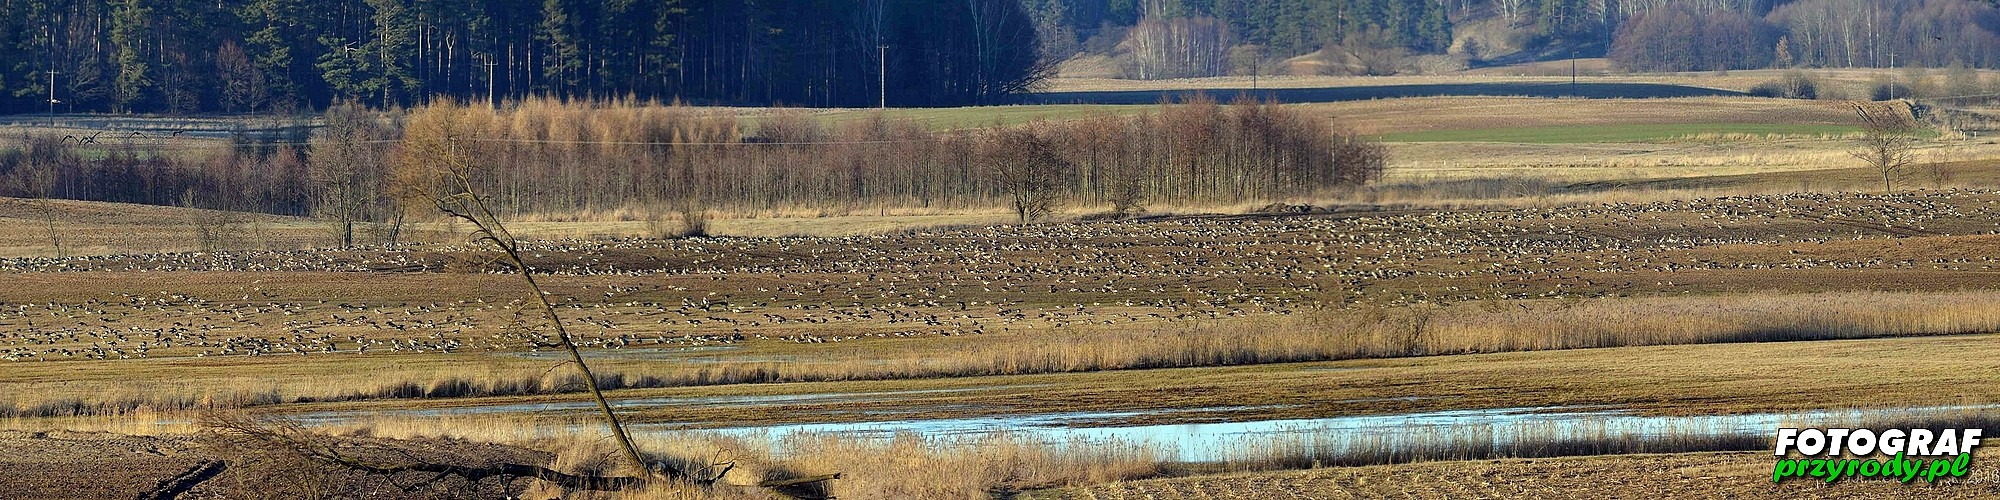 gęsie na polach koło Olecka